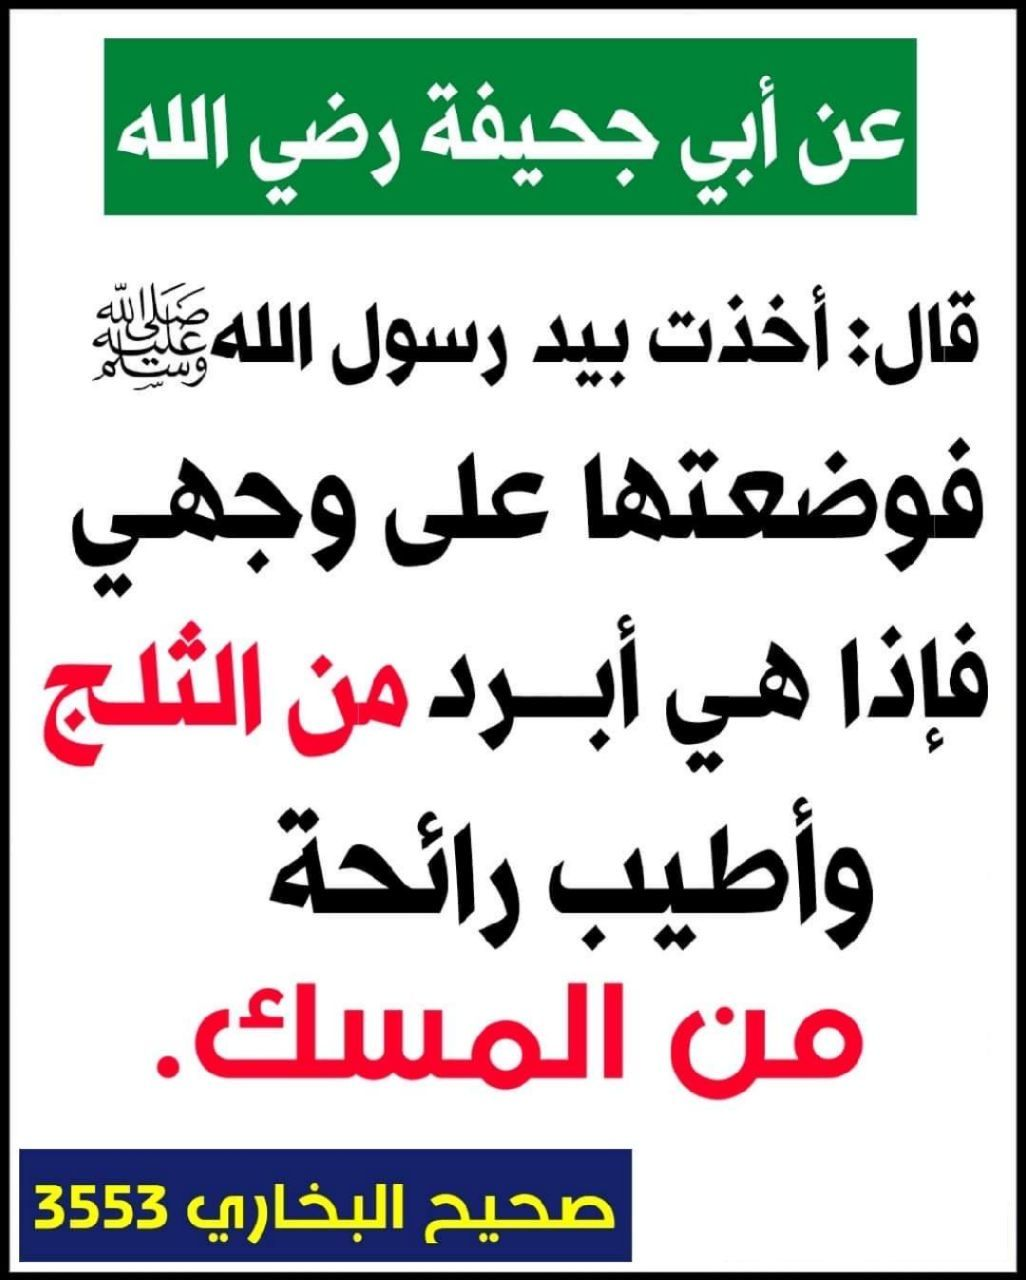 Pin By الأثر الجميل On أقوال الصحابة والعلماء Words Quotes Words Quotes